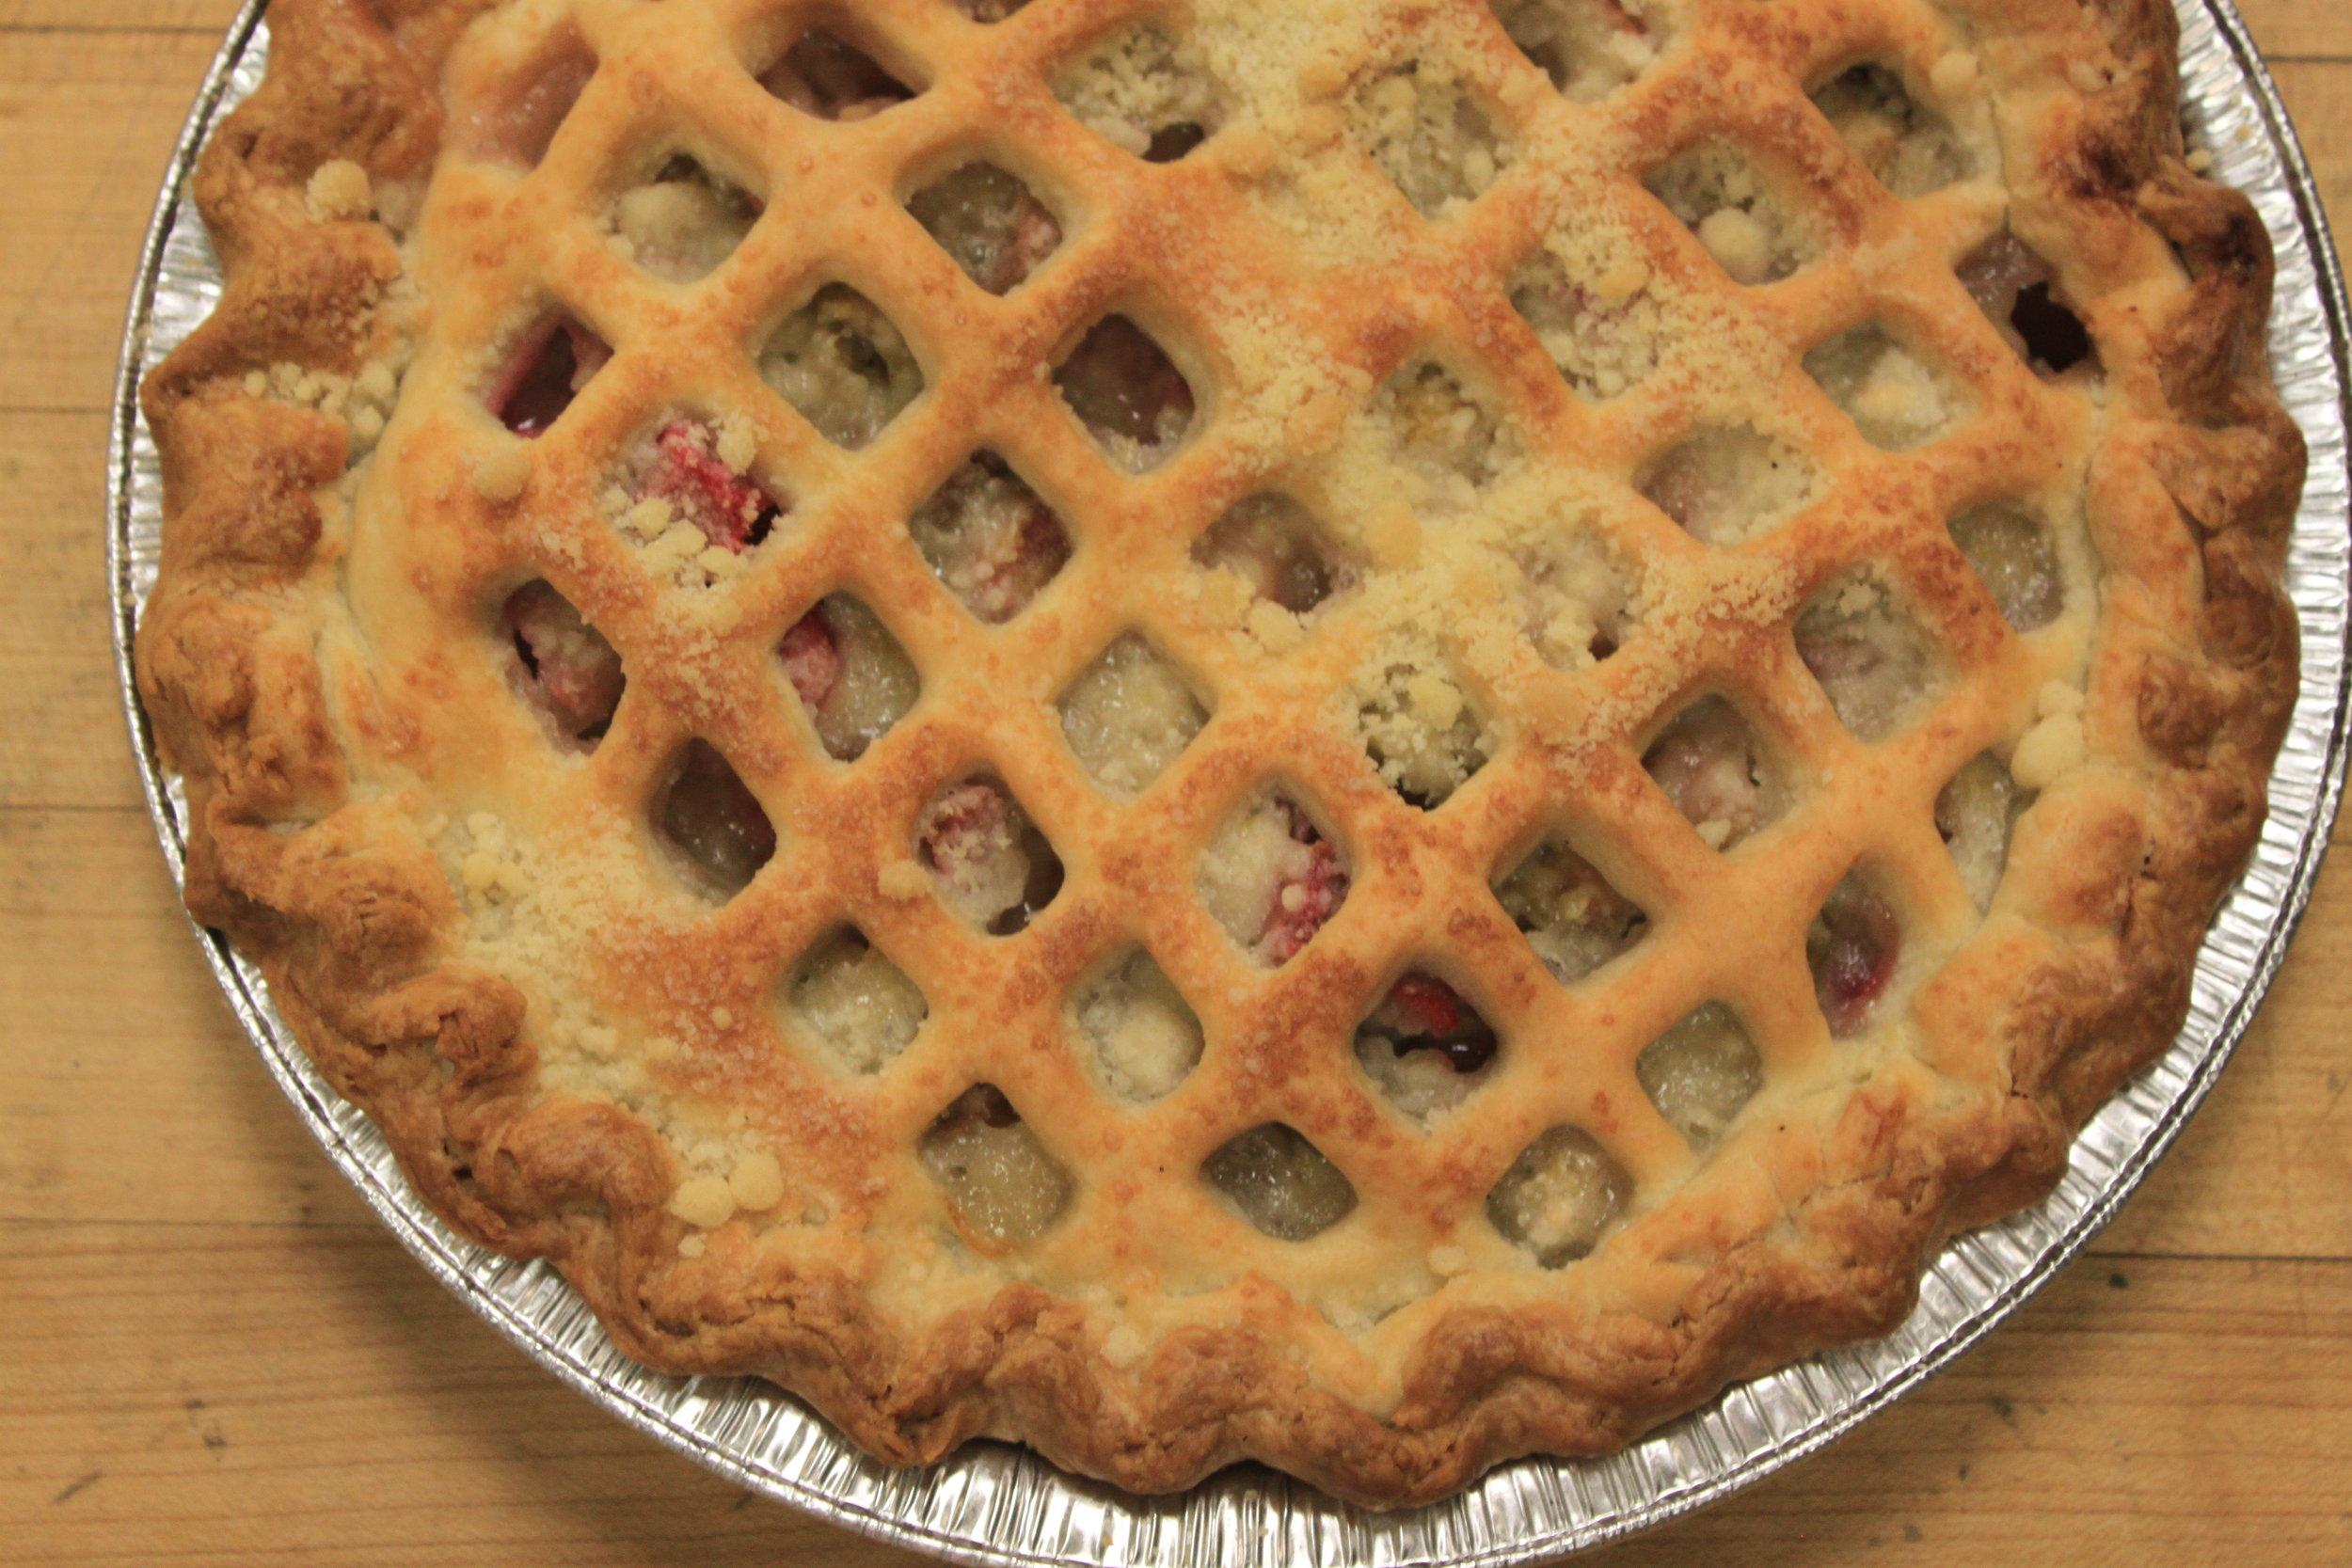 Strawberry Rhubarb Pie (late Spring)